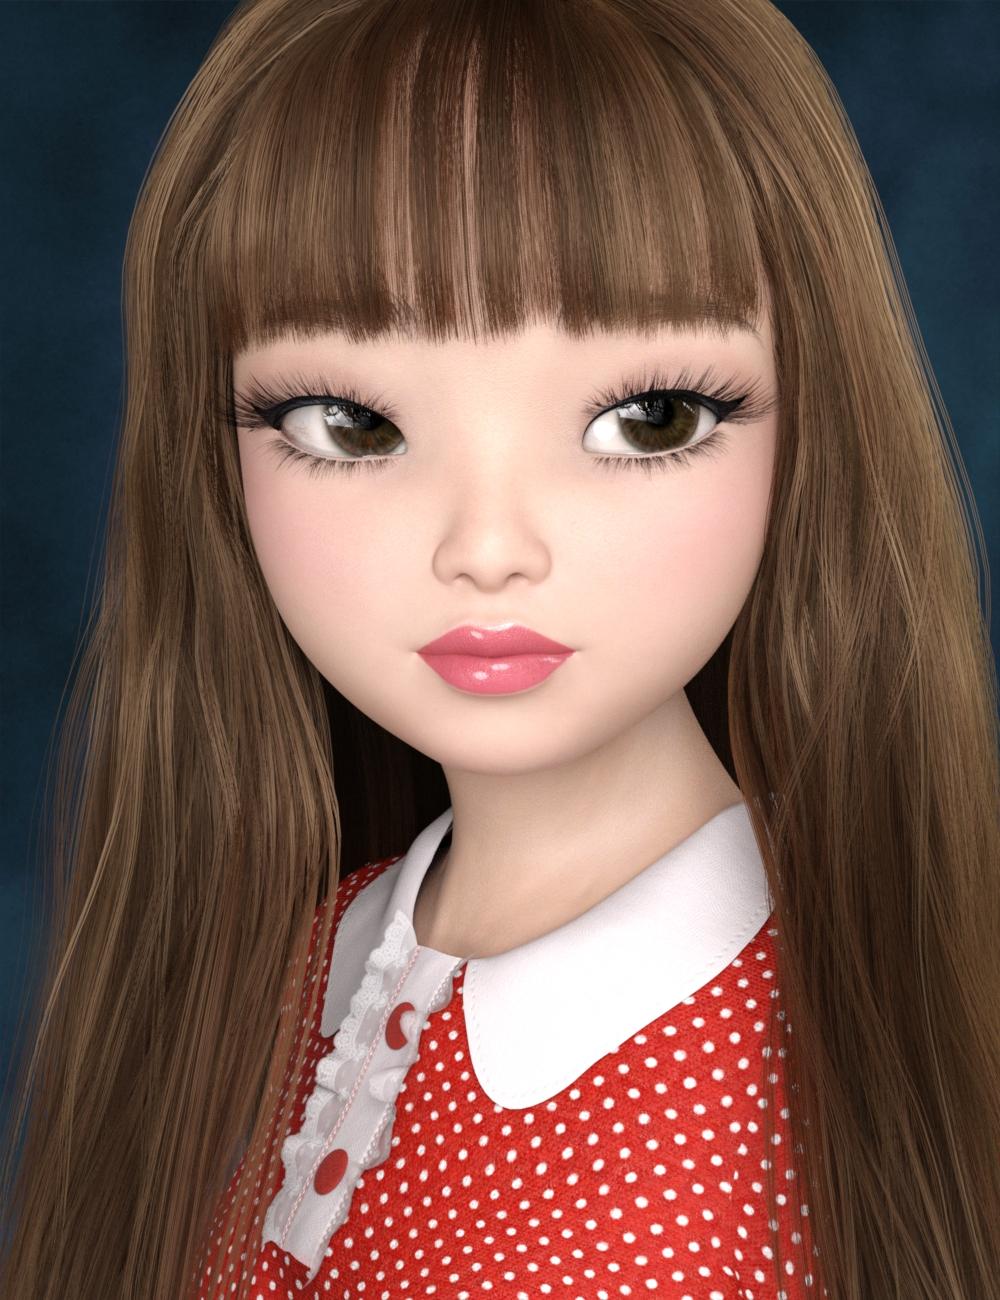 Brigitte for Bugga Boo by: Tsukikawa, 3D Models by Daz 3D